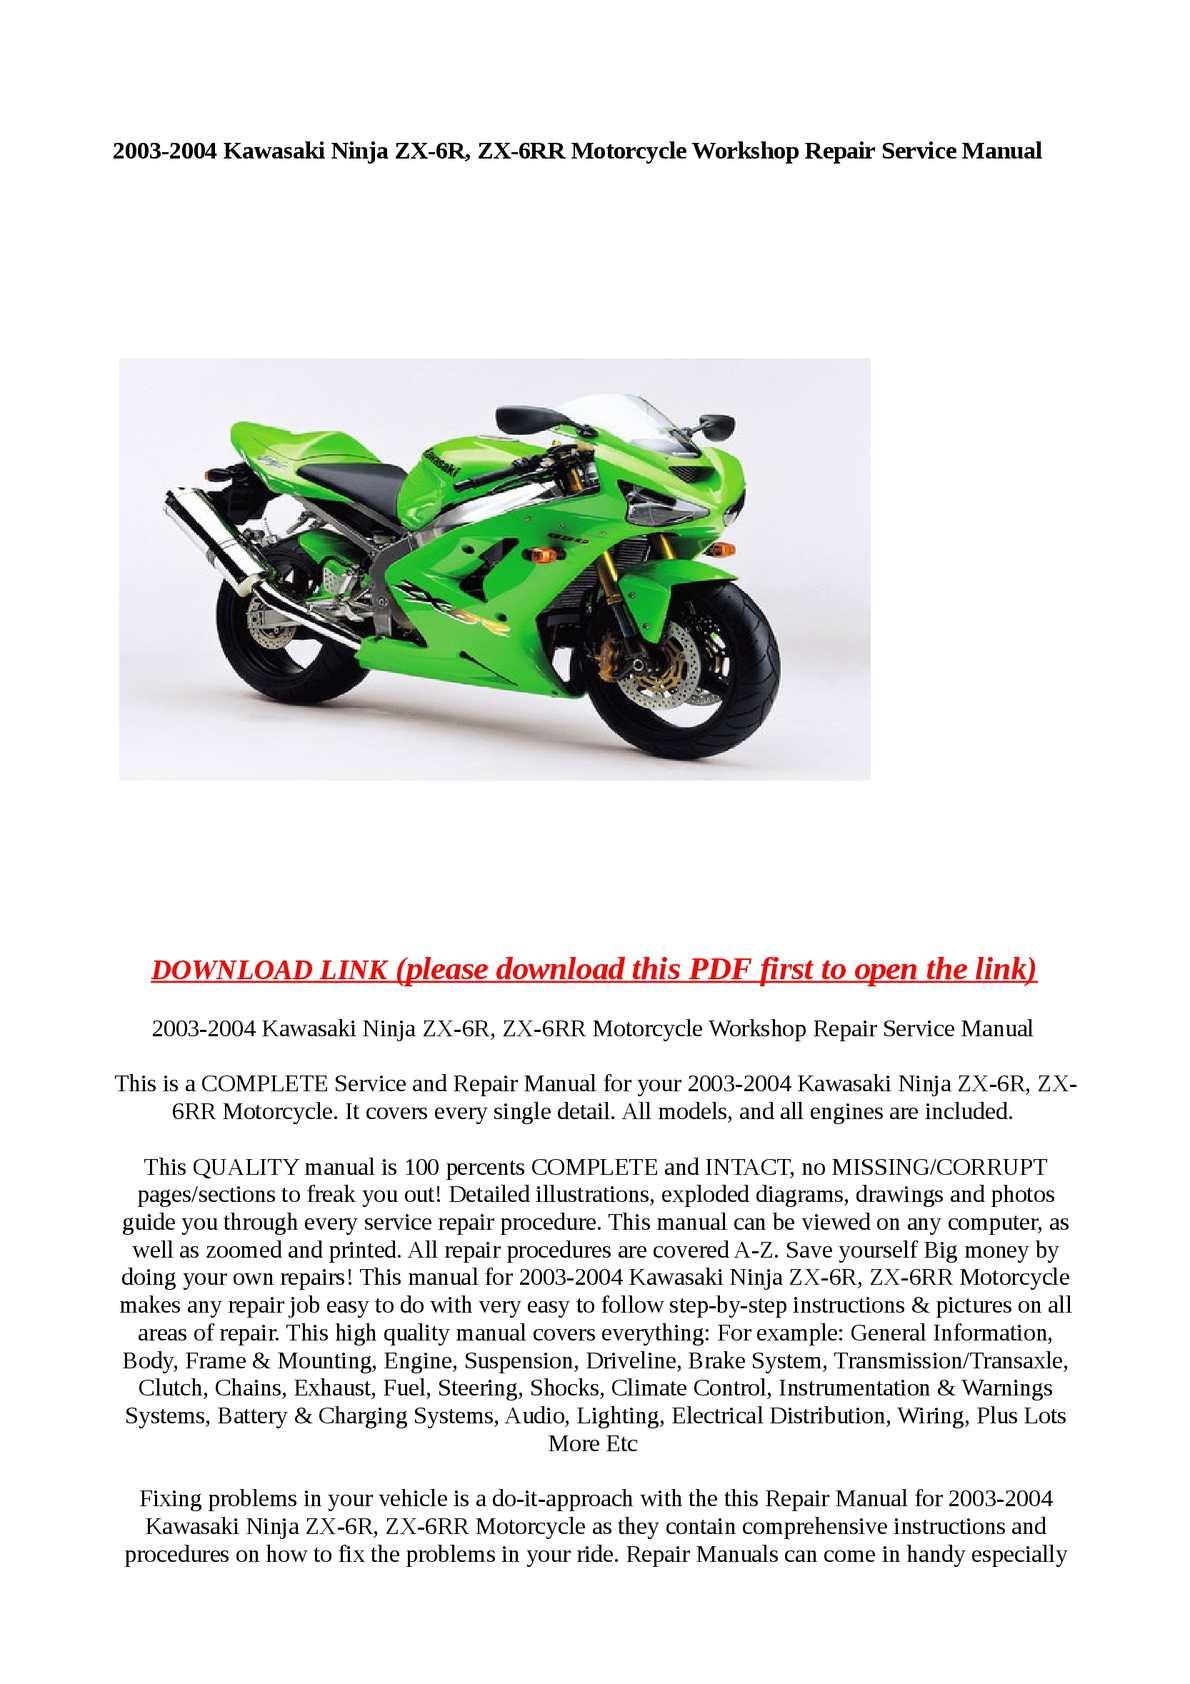 Calaméo - 2003-2004 Kawasaki Ninja ZX-6R, ZX-6RR Motorcycle Workshop Repair  Service Manual